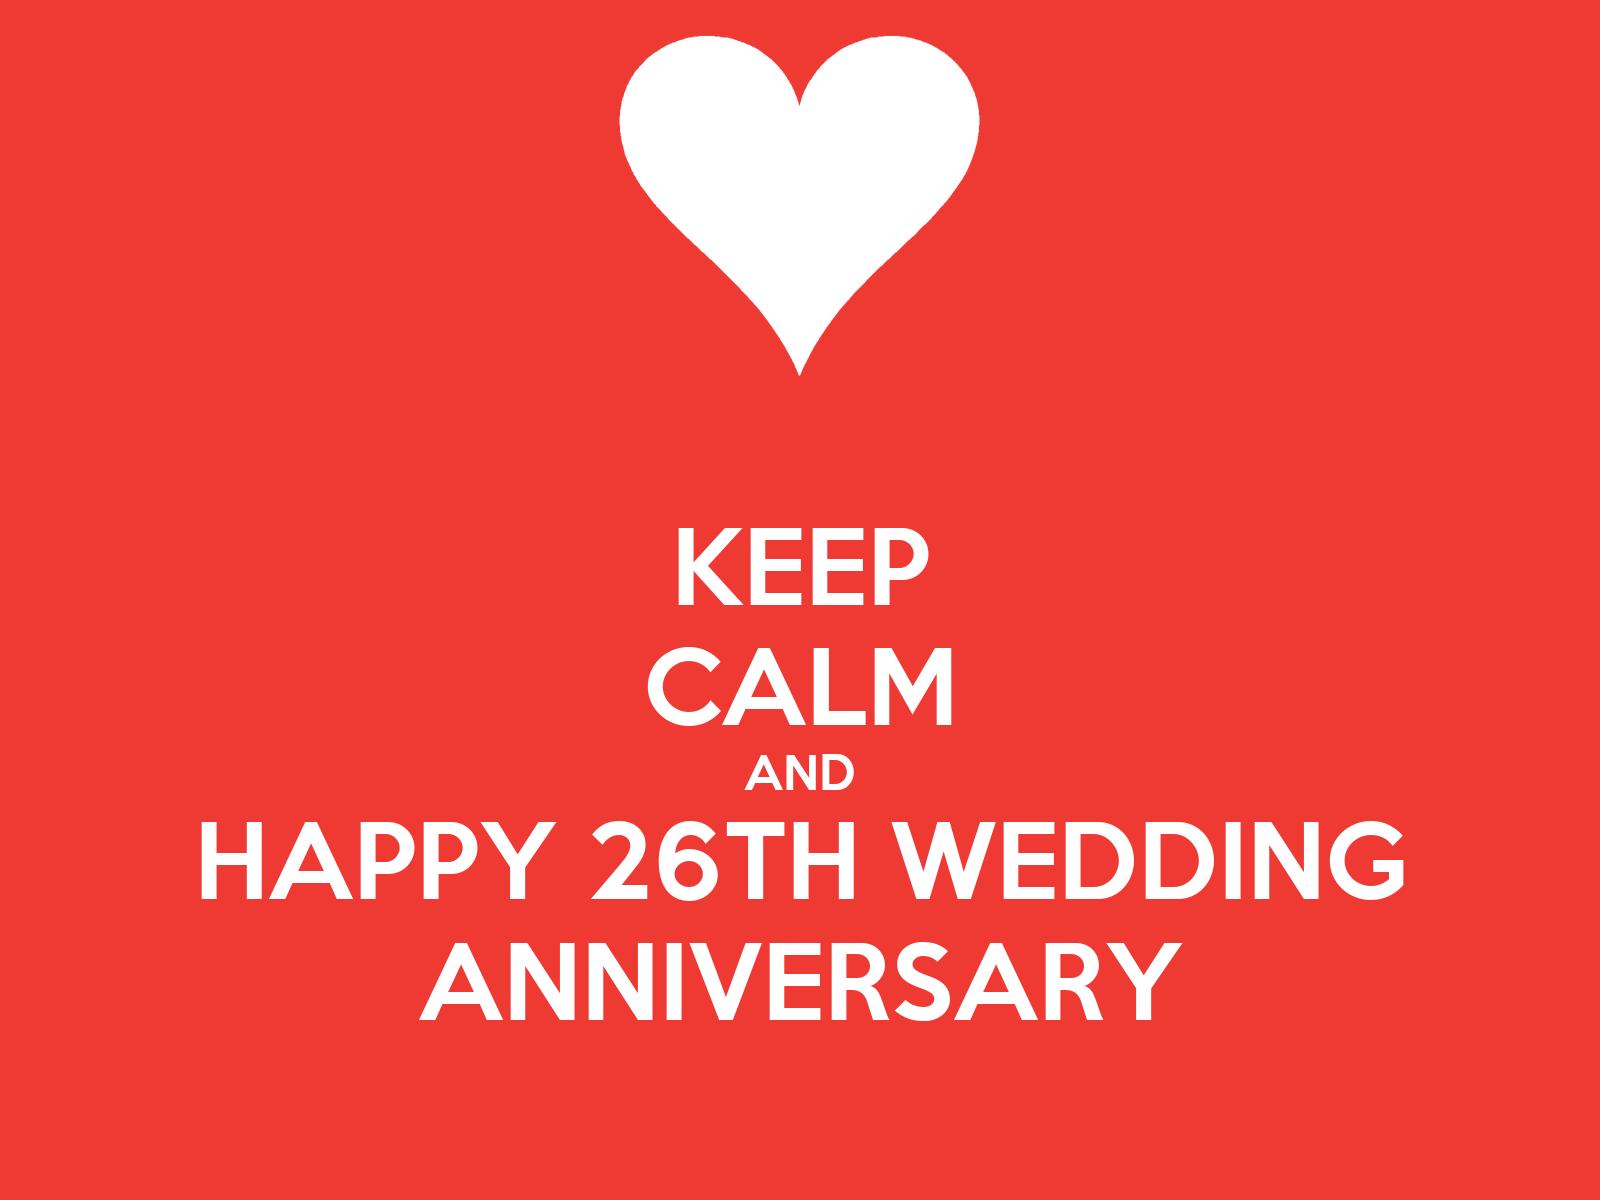 26th Wedding Anniversary Gift For Husband : KEEP CALM AND HAPPY 26TH WEDDING ANNIVERSARY